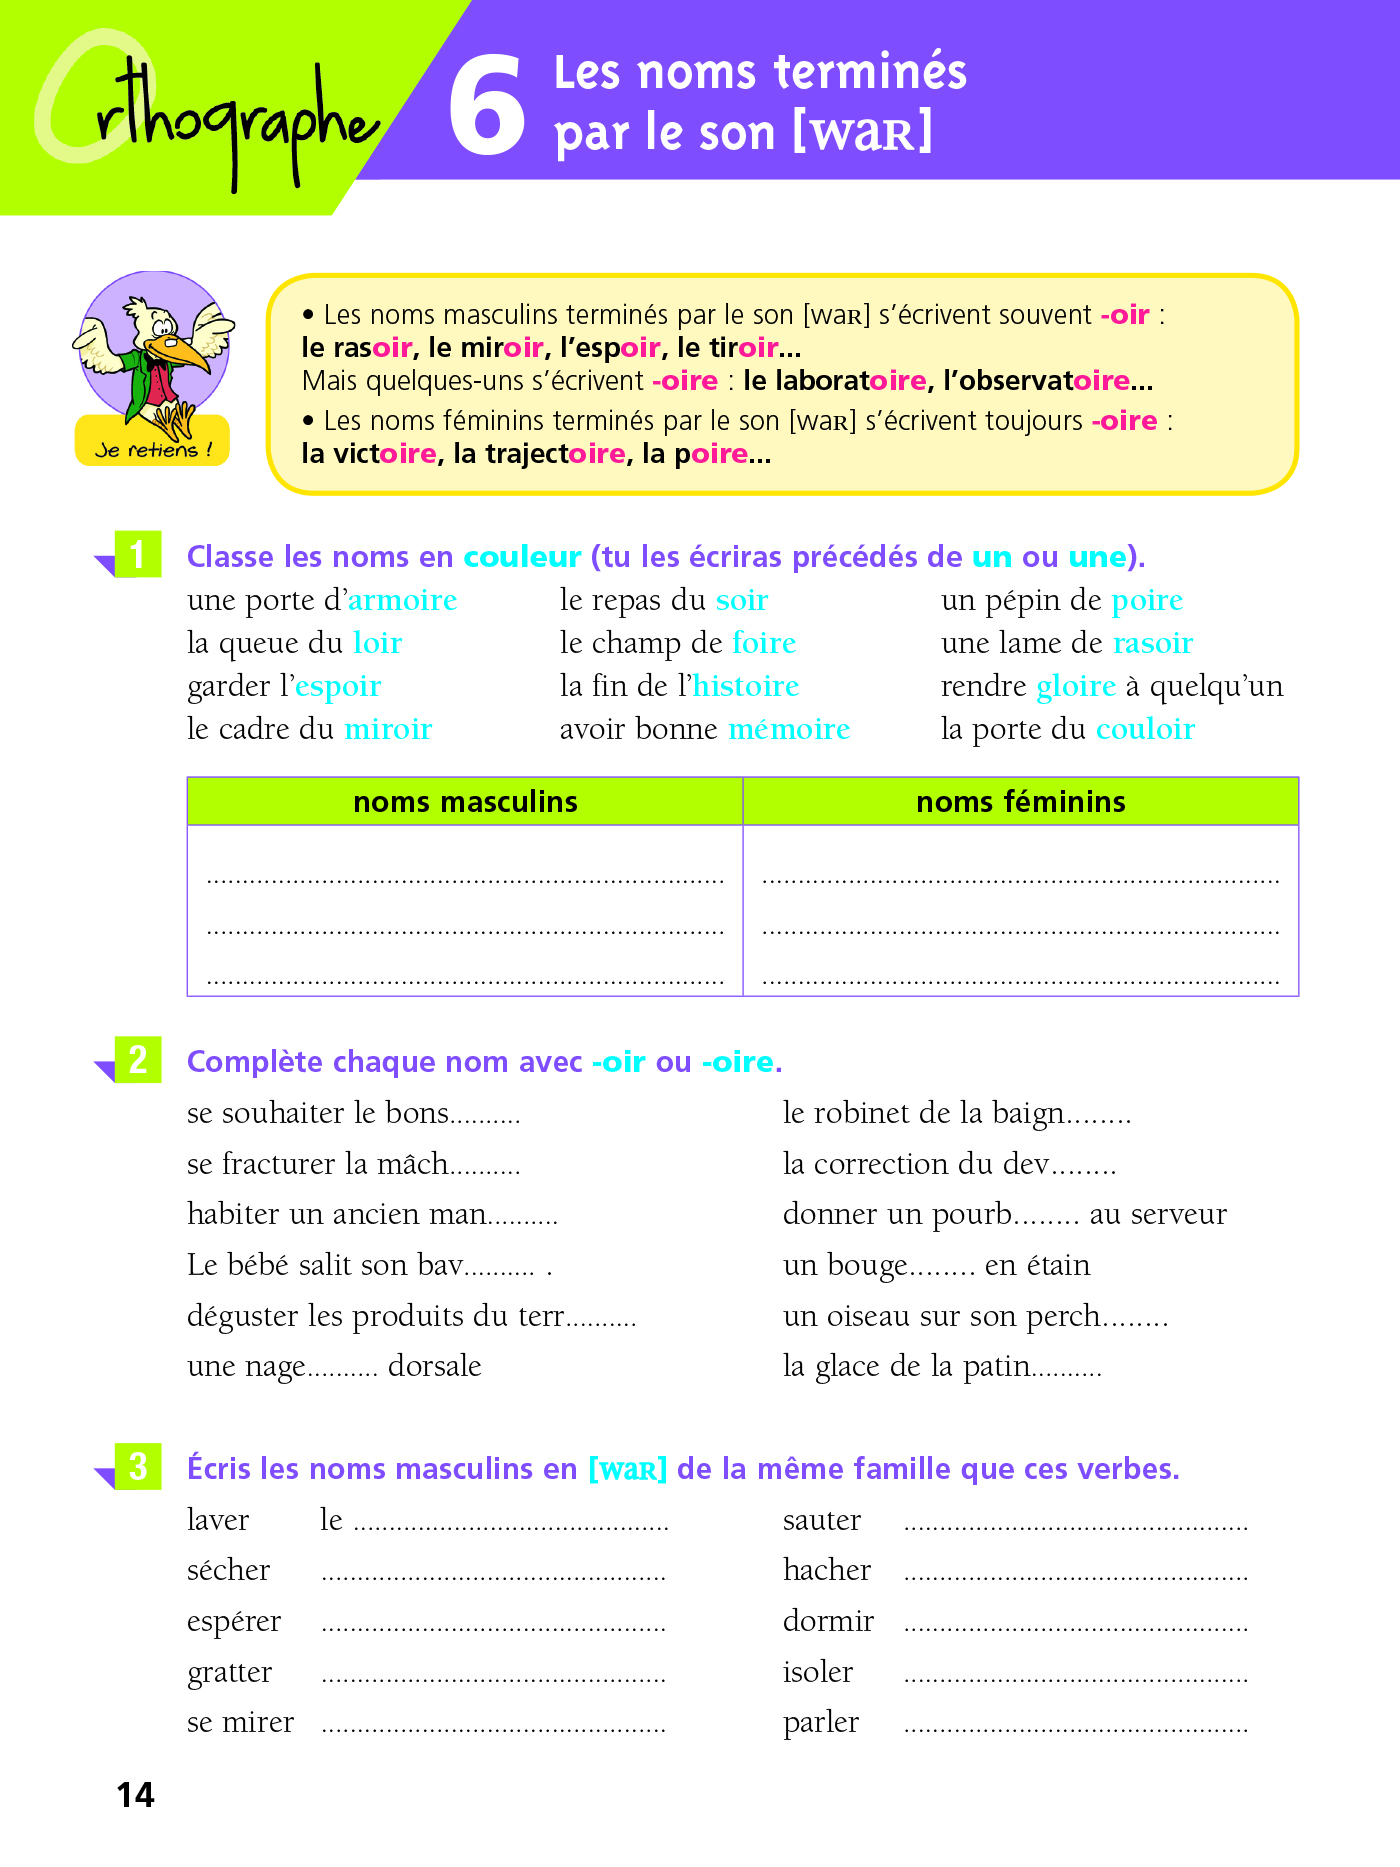 Cahier Bled Exercices D Orthographe Cm1 Hachette Education Famille Eleves Etudiants